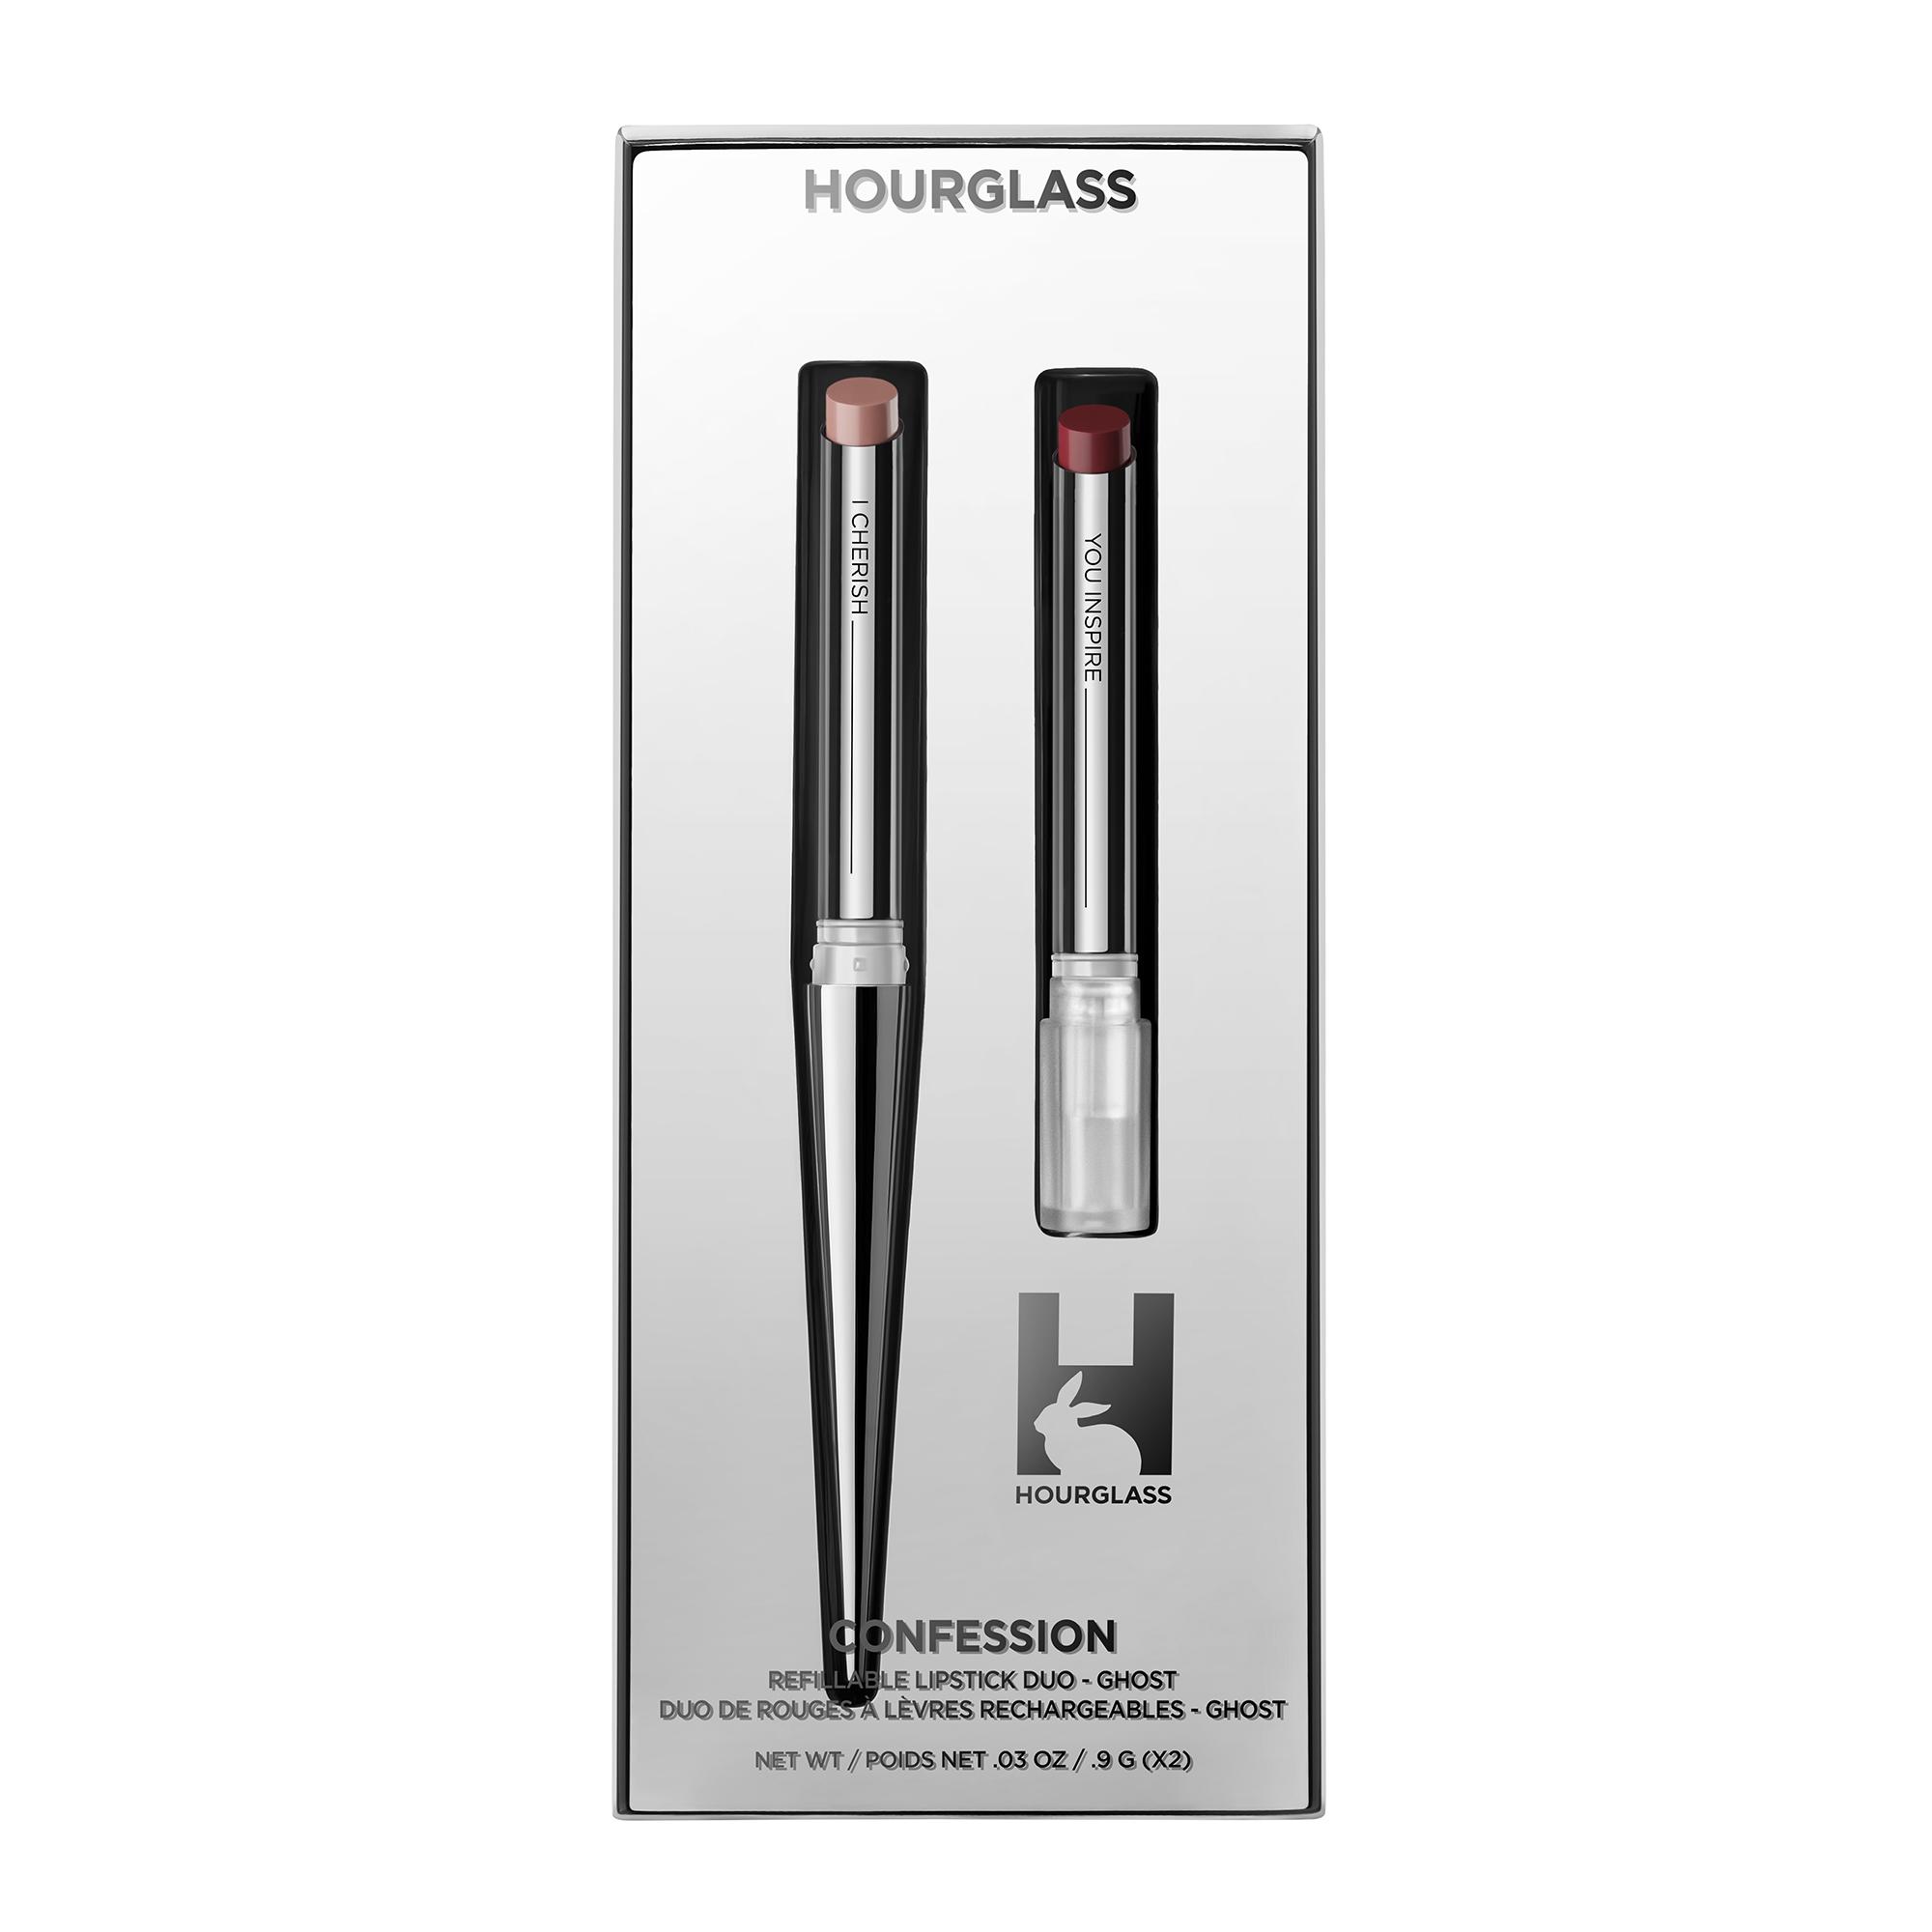 Duo de barra de labios recargables de Hourglass